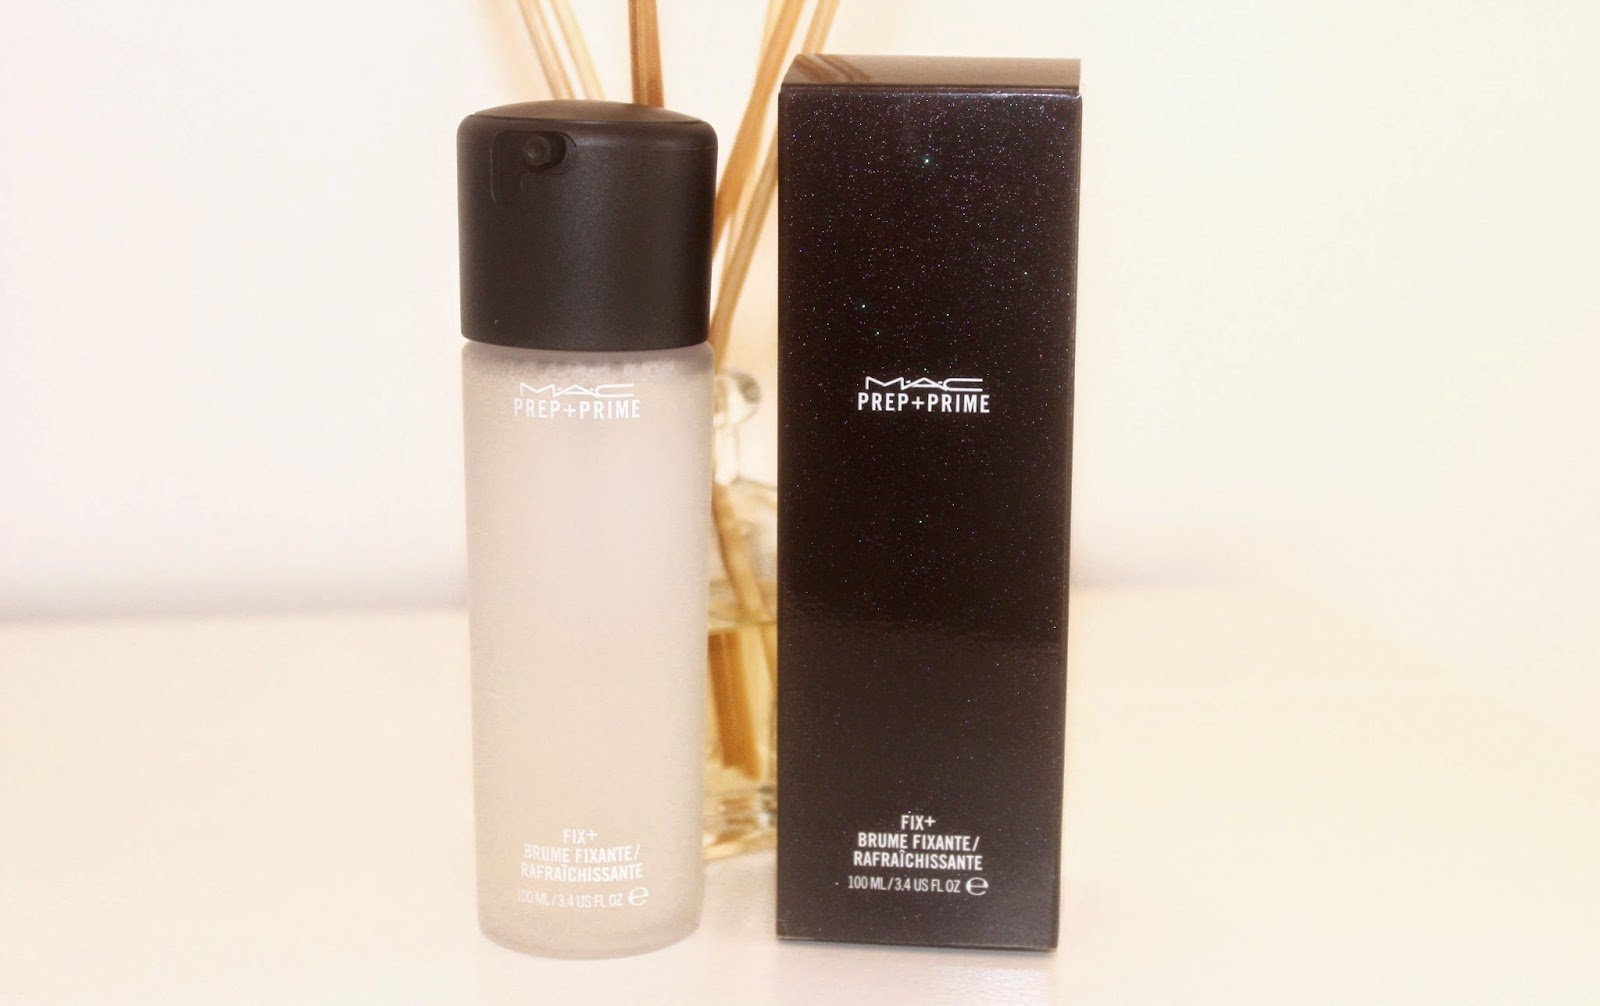 M.A.C MAC Fix+ Skin Refresher / Finishing Mist Full Size 3.4 Oz.